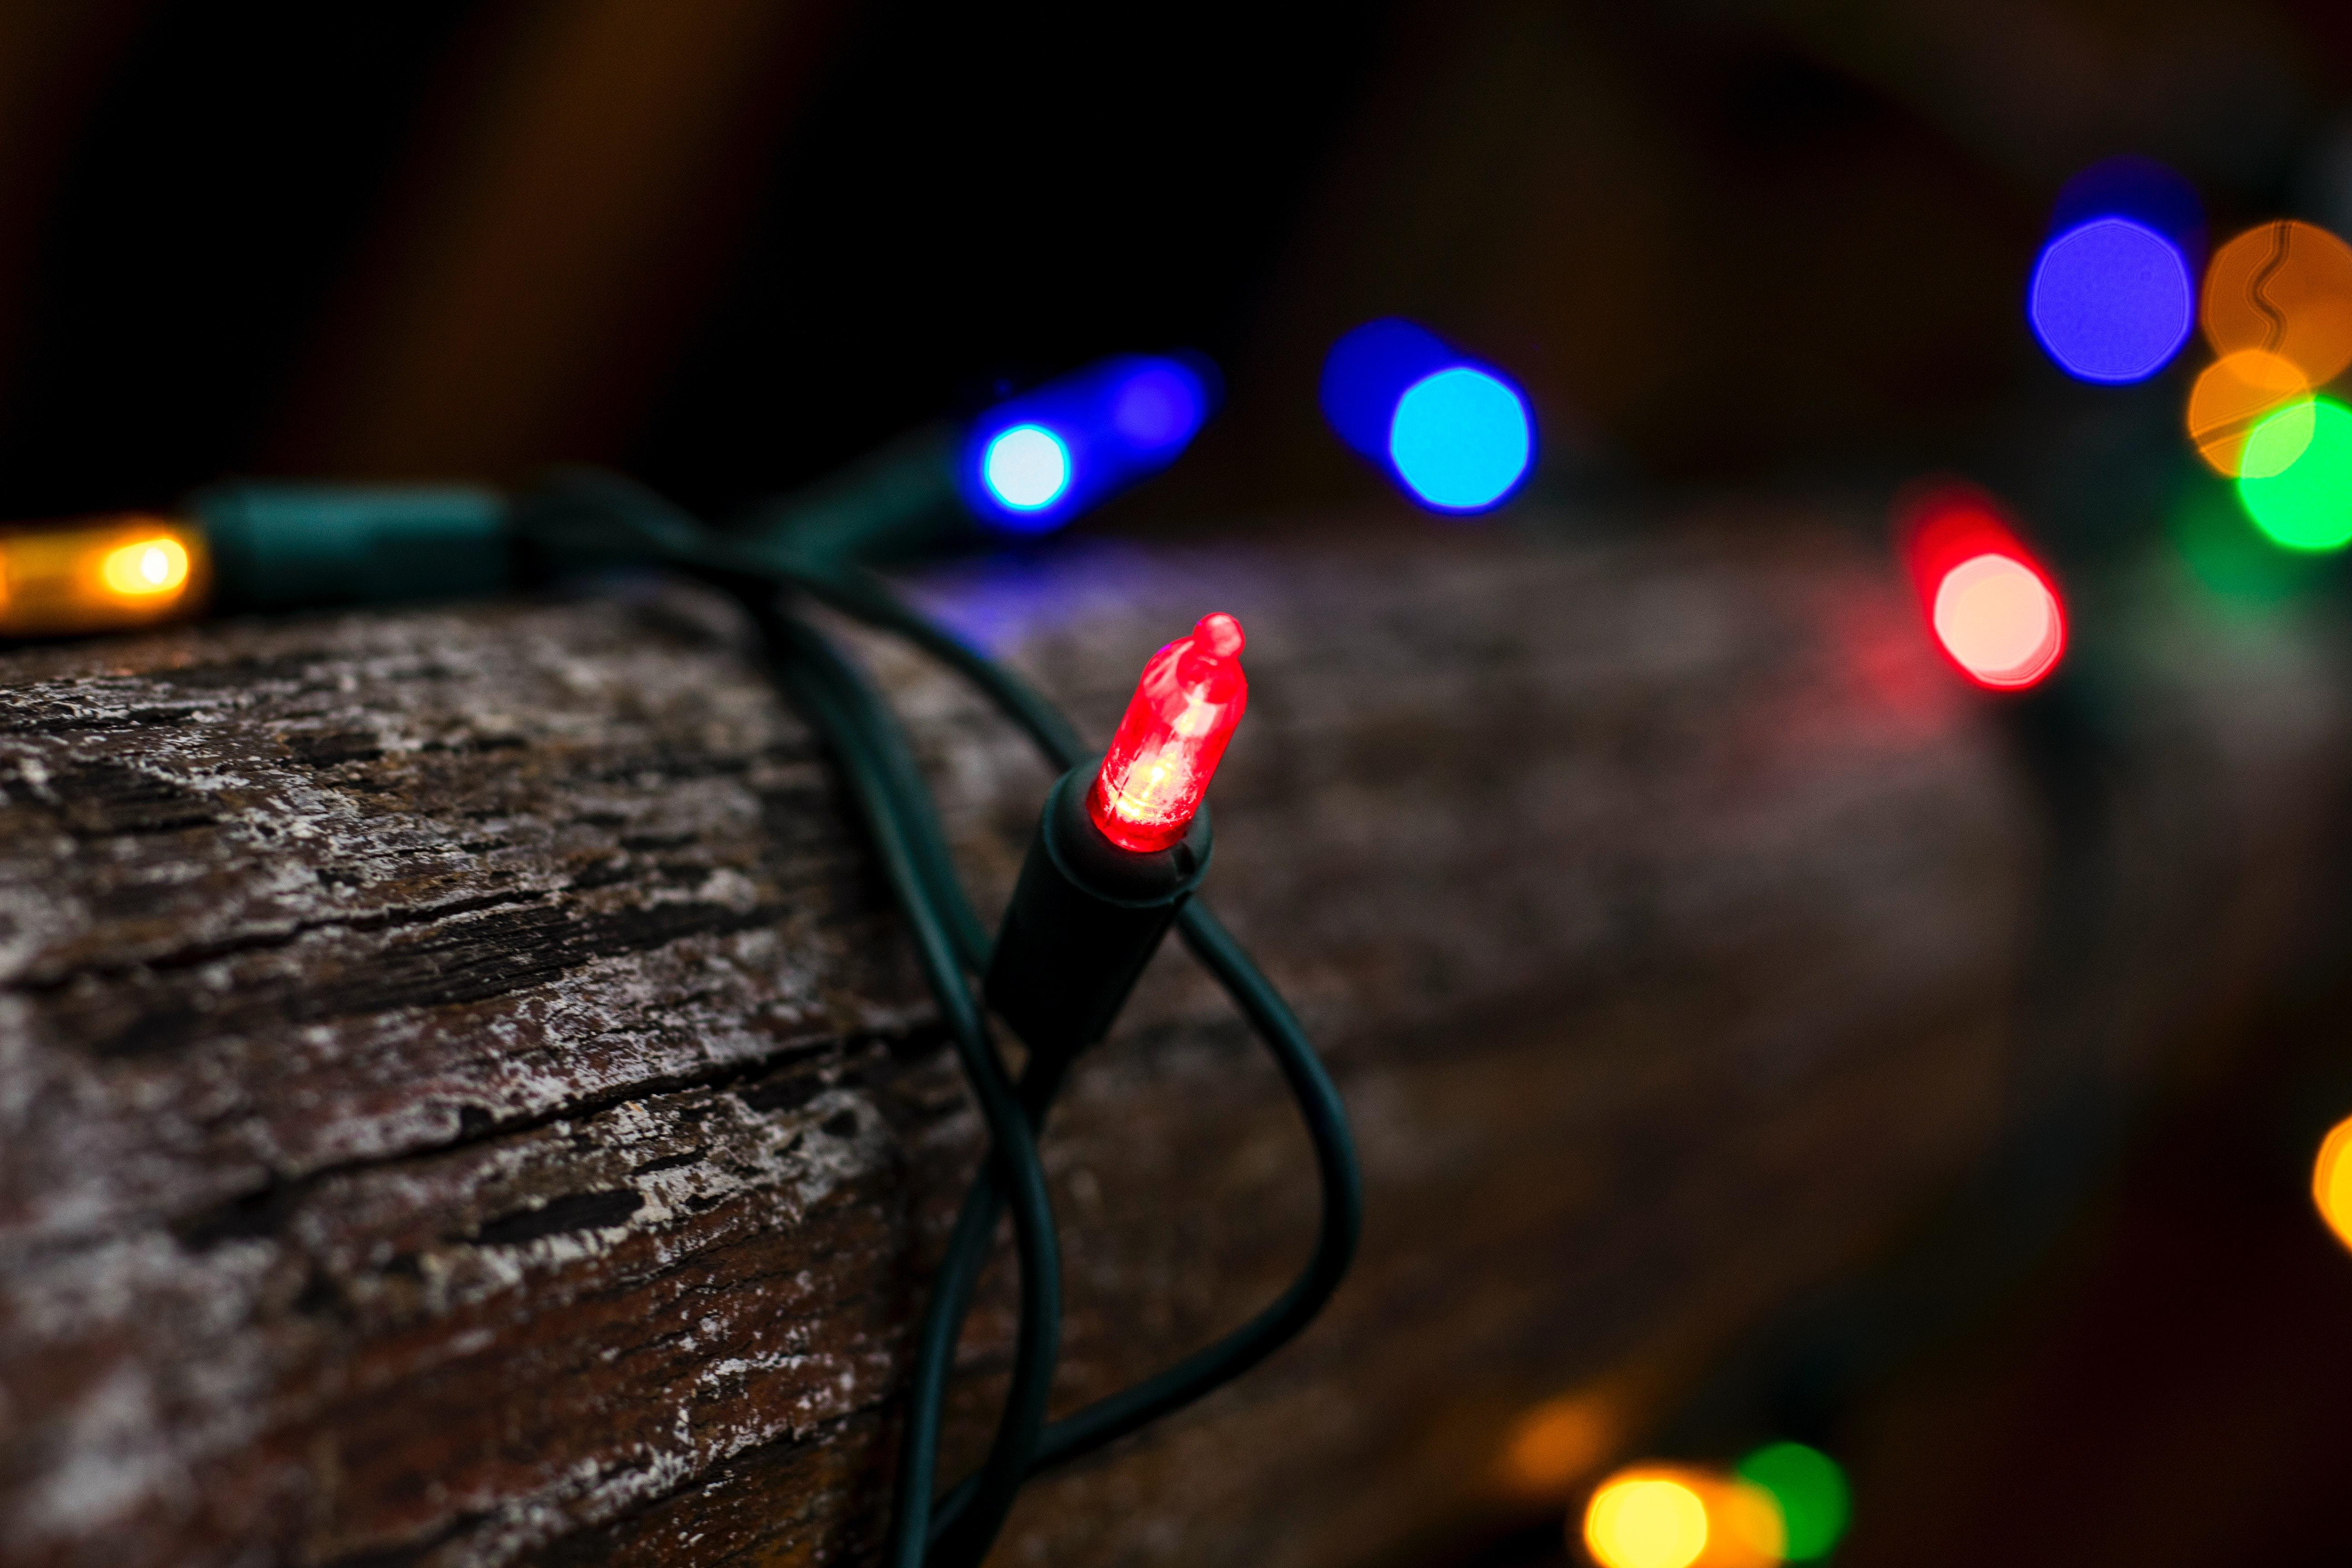 Colorful Christmas Lights Aesthetic.Tilt Shift Lens Photography Of String Lights Free Stock Photo